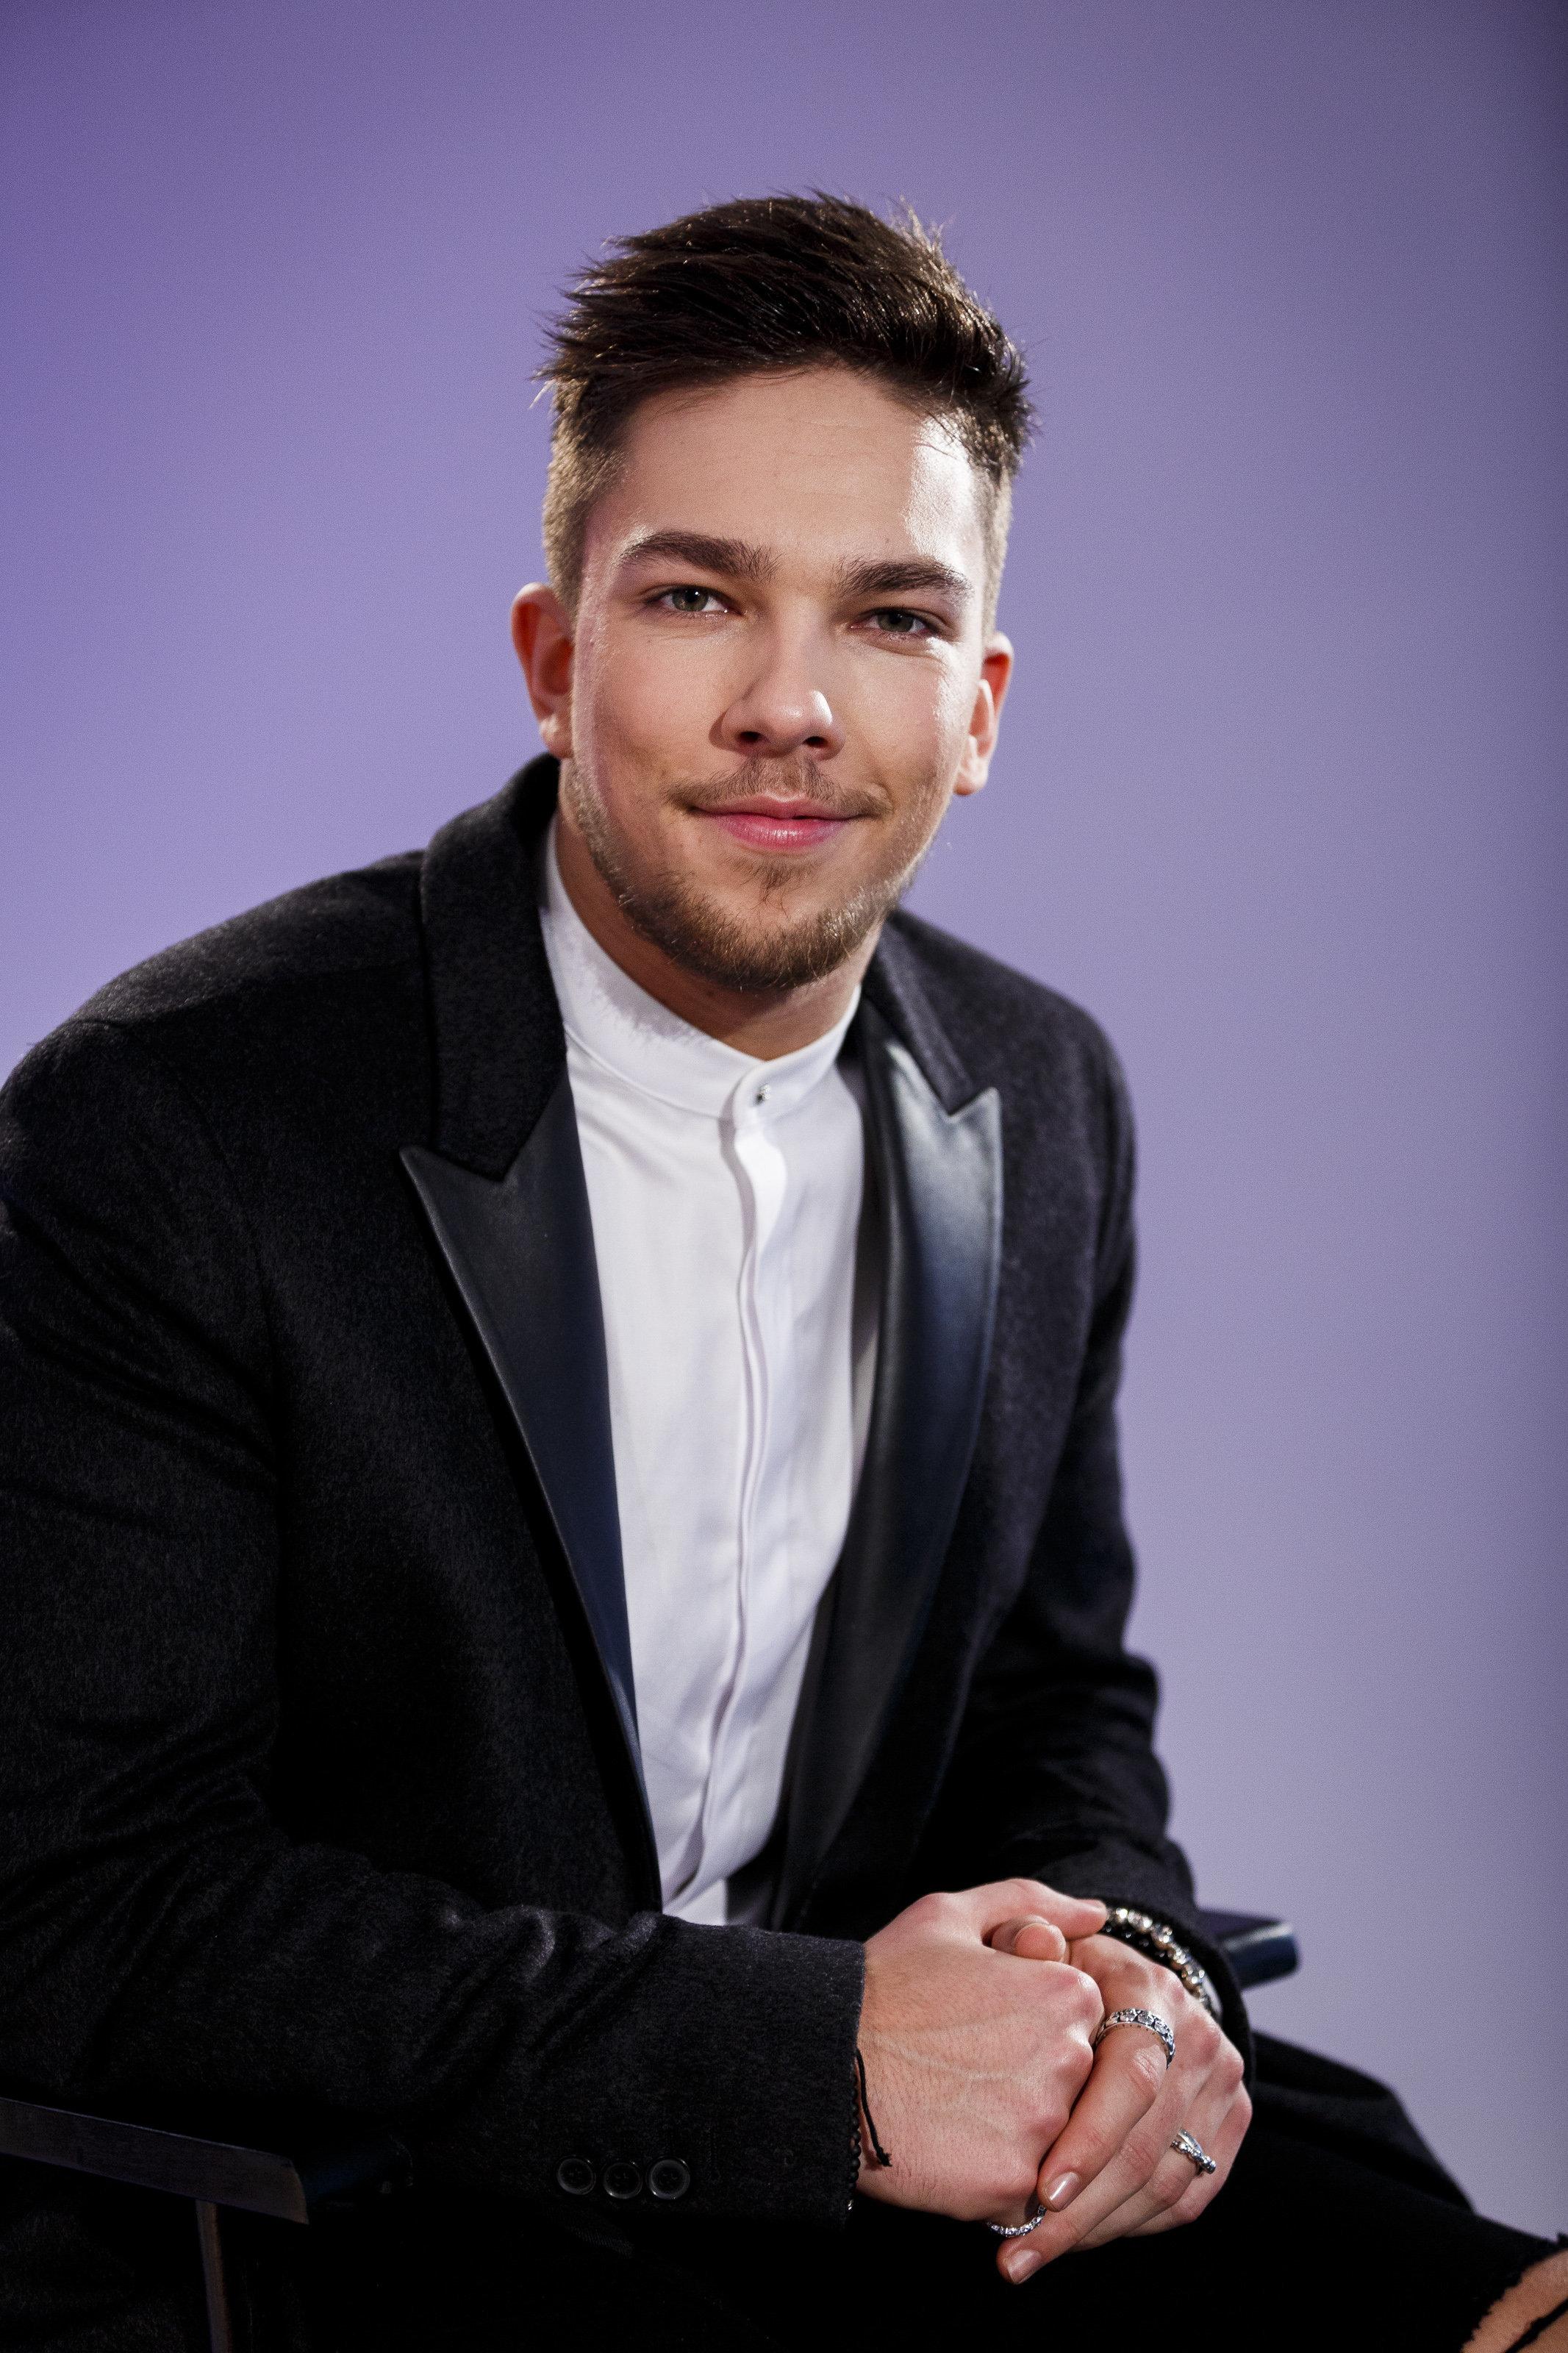 'X Factor' Winner Matt Terry Sets Record Straight On Nicole Scherzinger Flirting